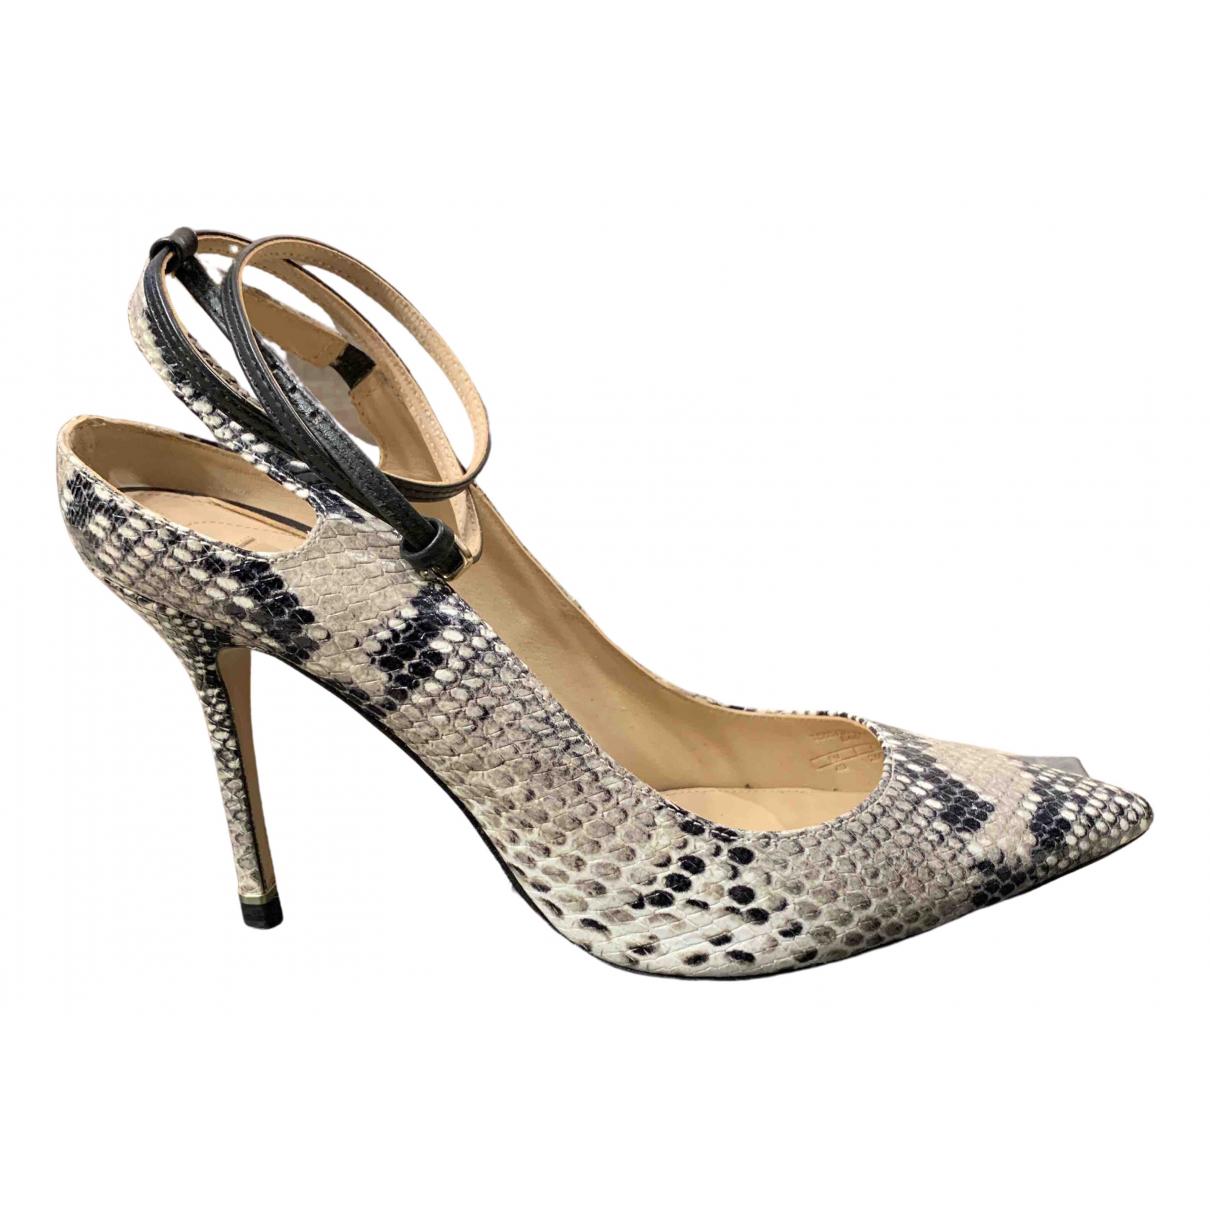 Massimo Dutti N Multicolour Leather Heels for Women 40 EU